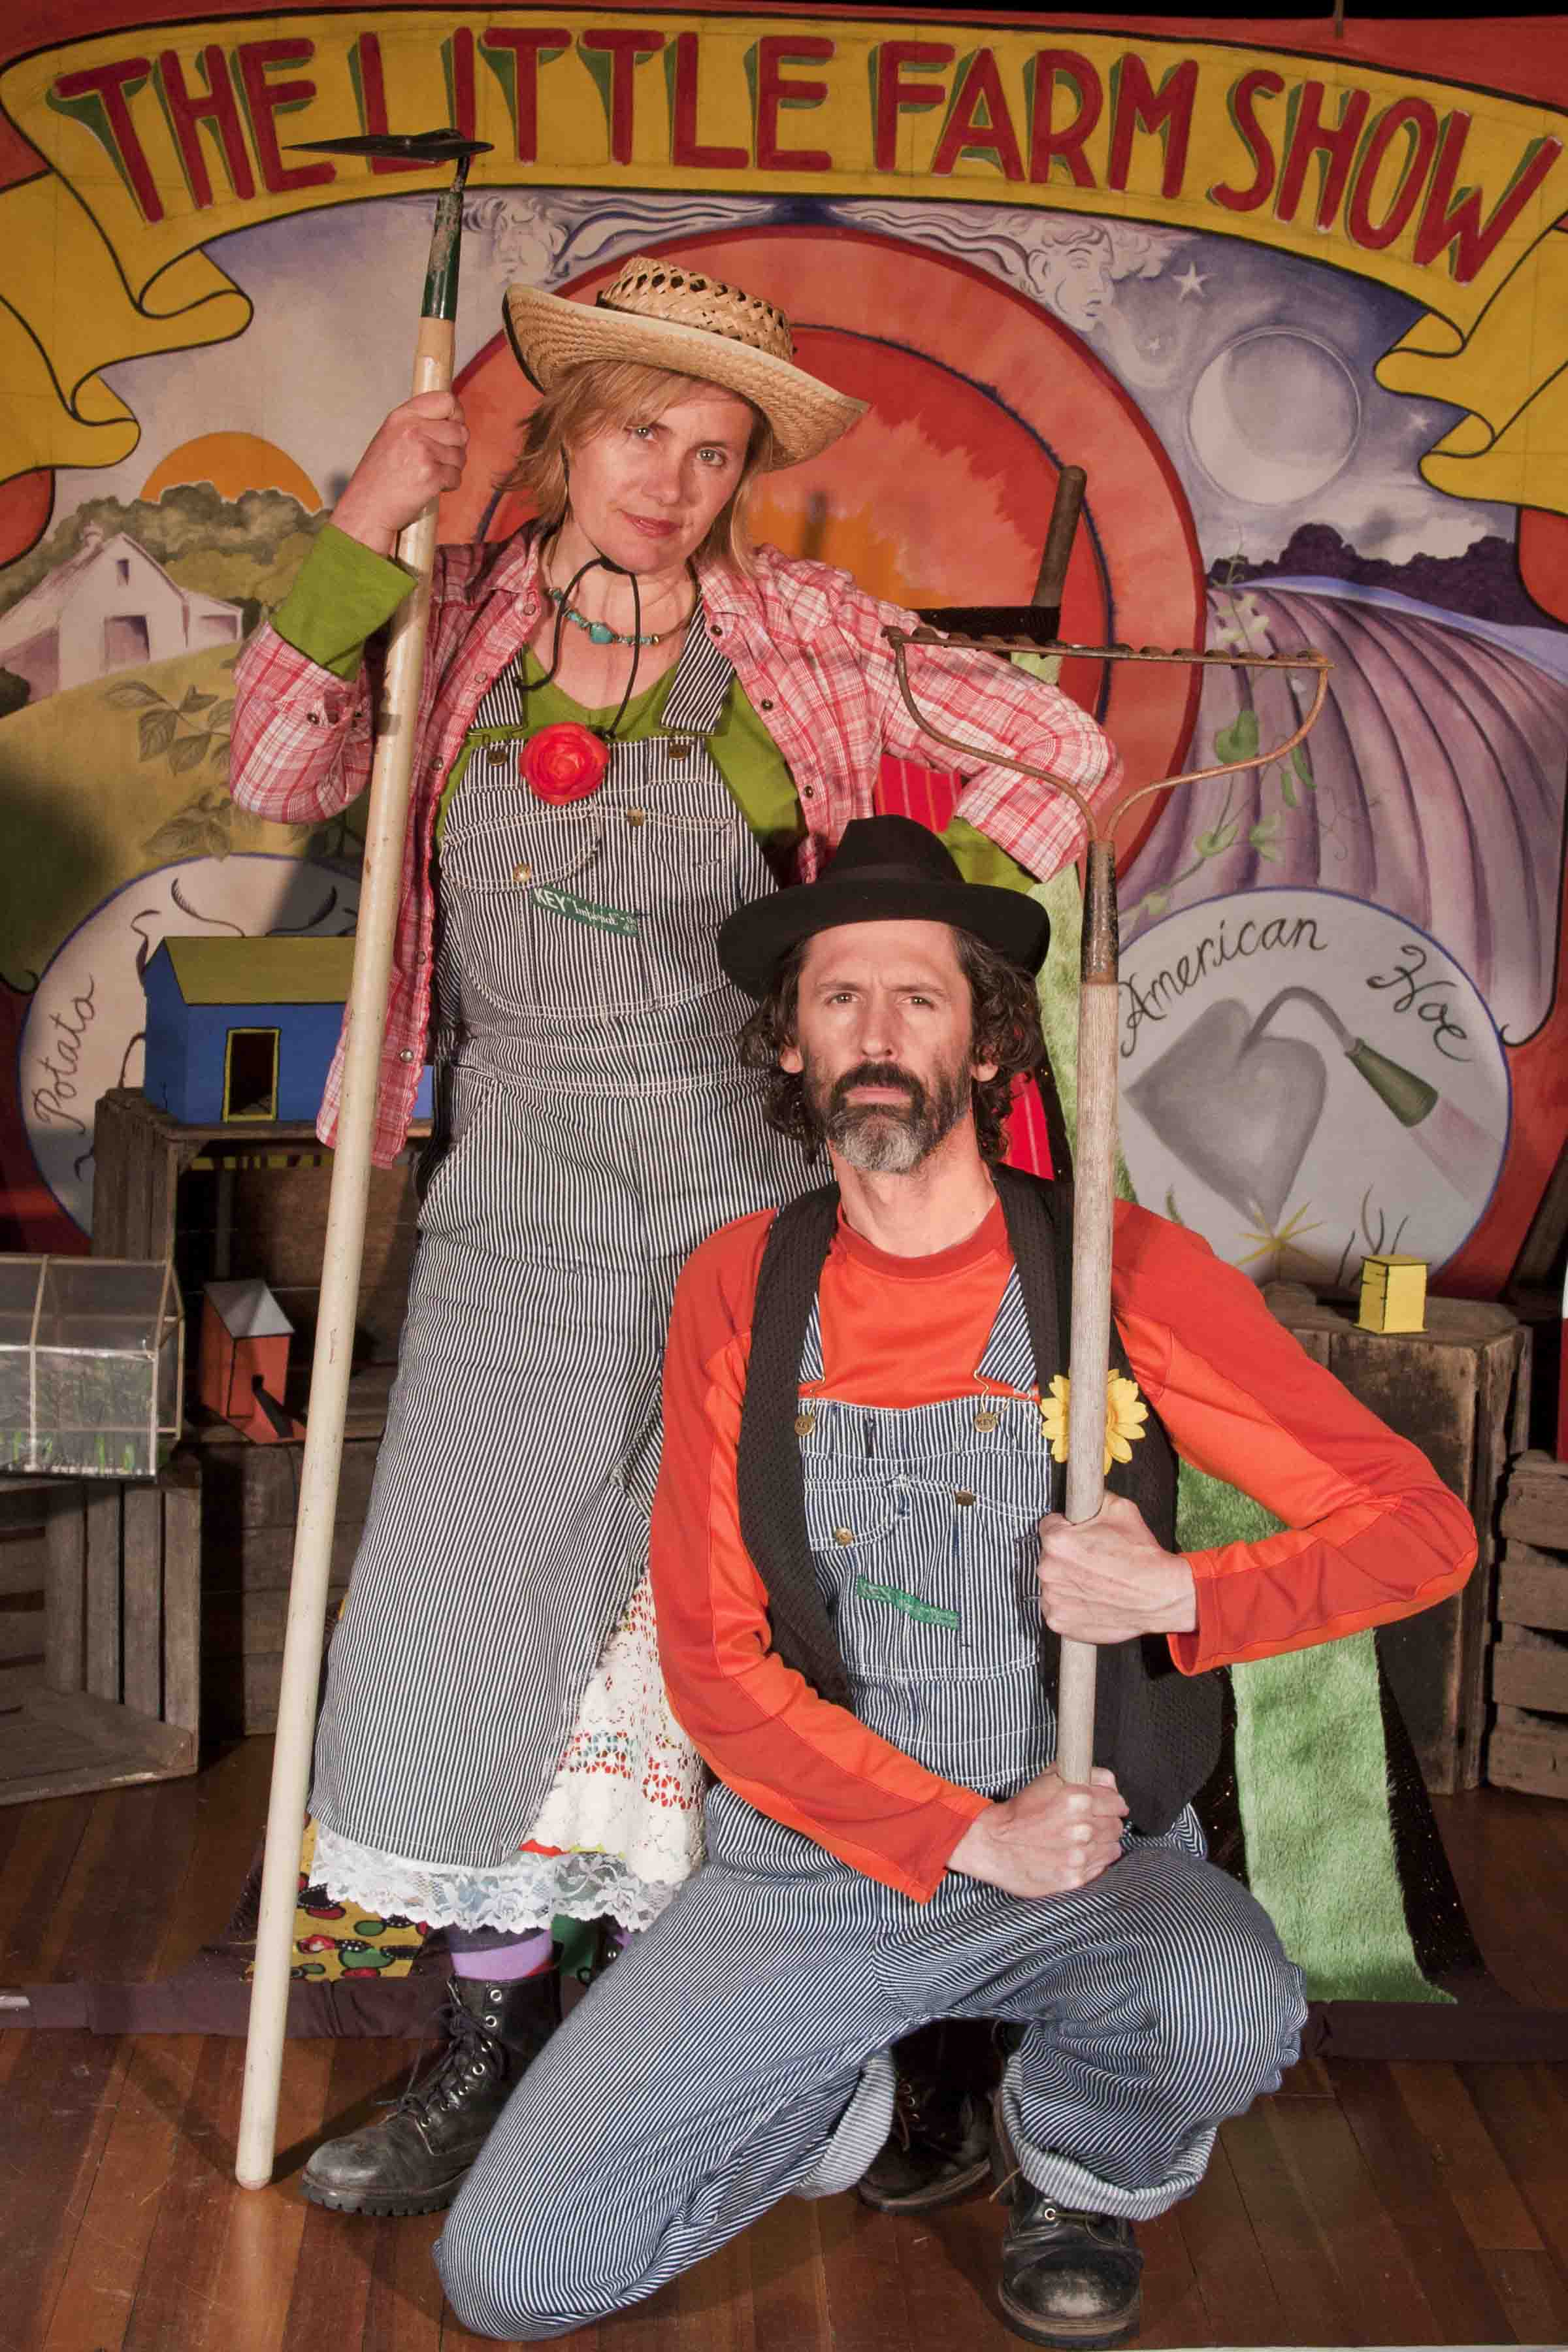 Ko-THE-LITTLE-FARM-SHOW-NACL-Theatre-web